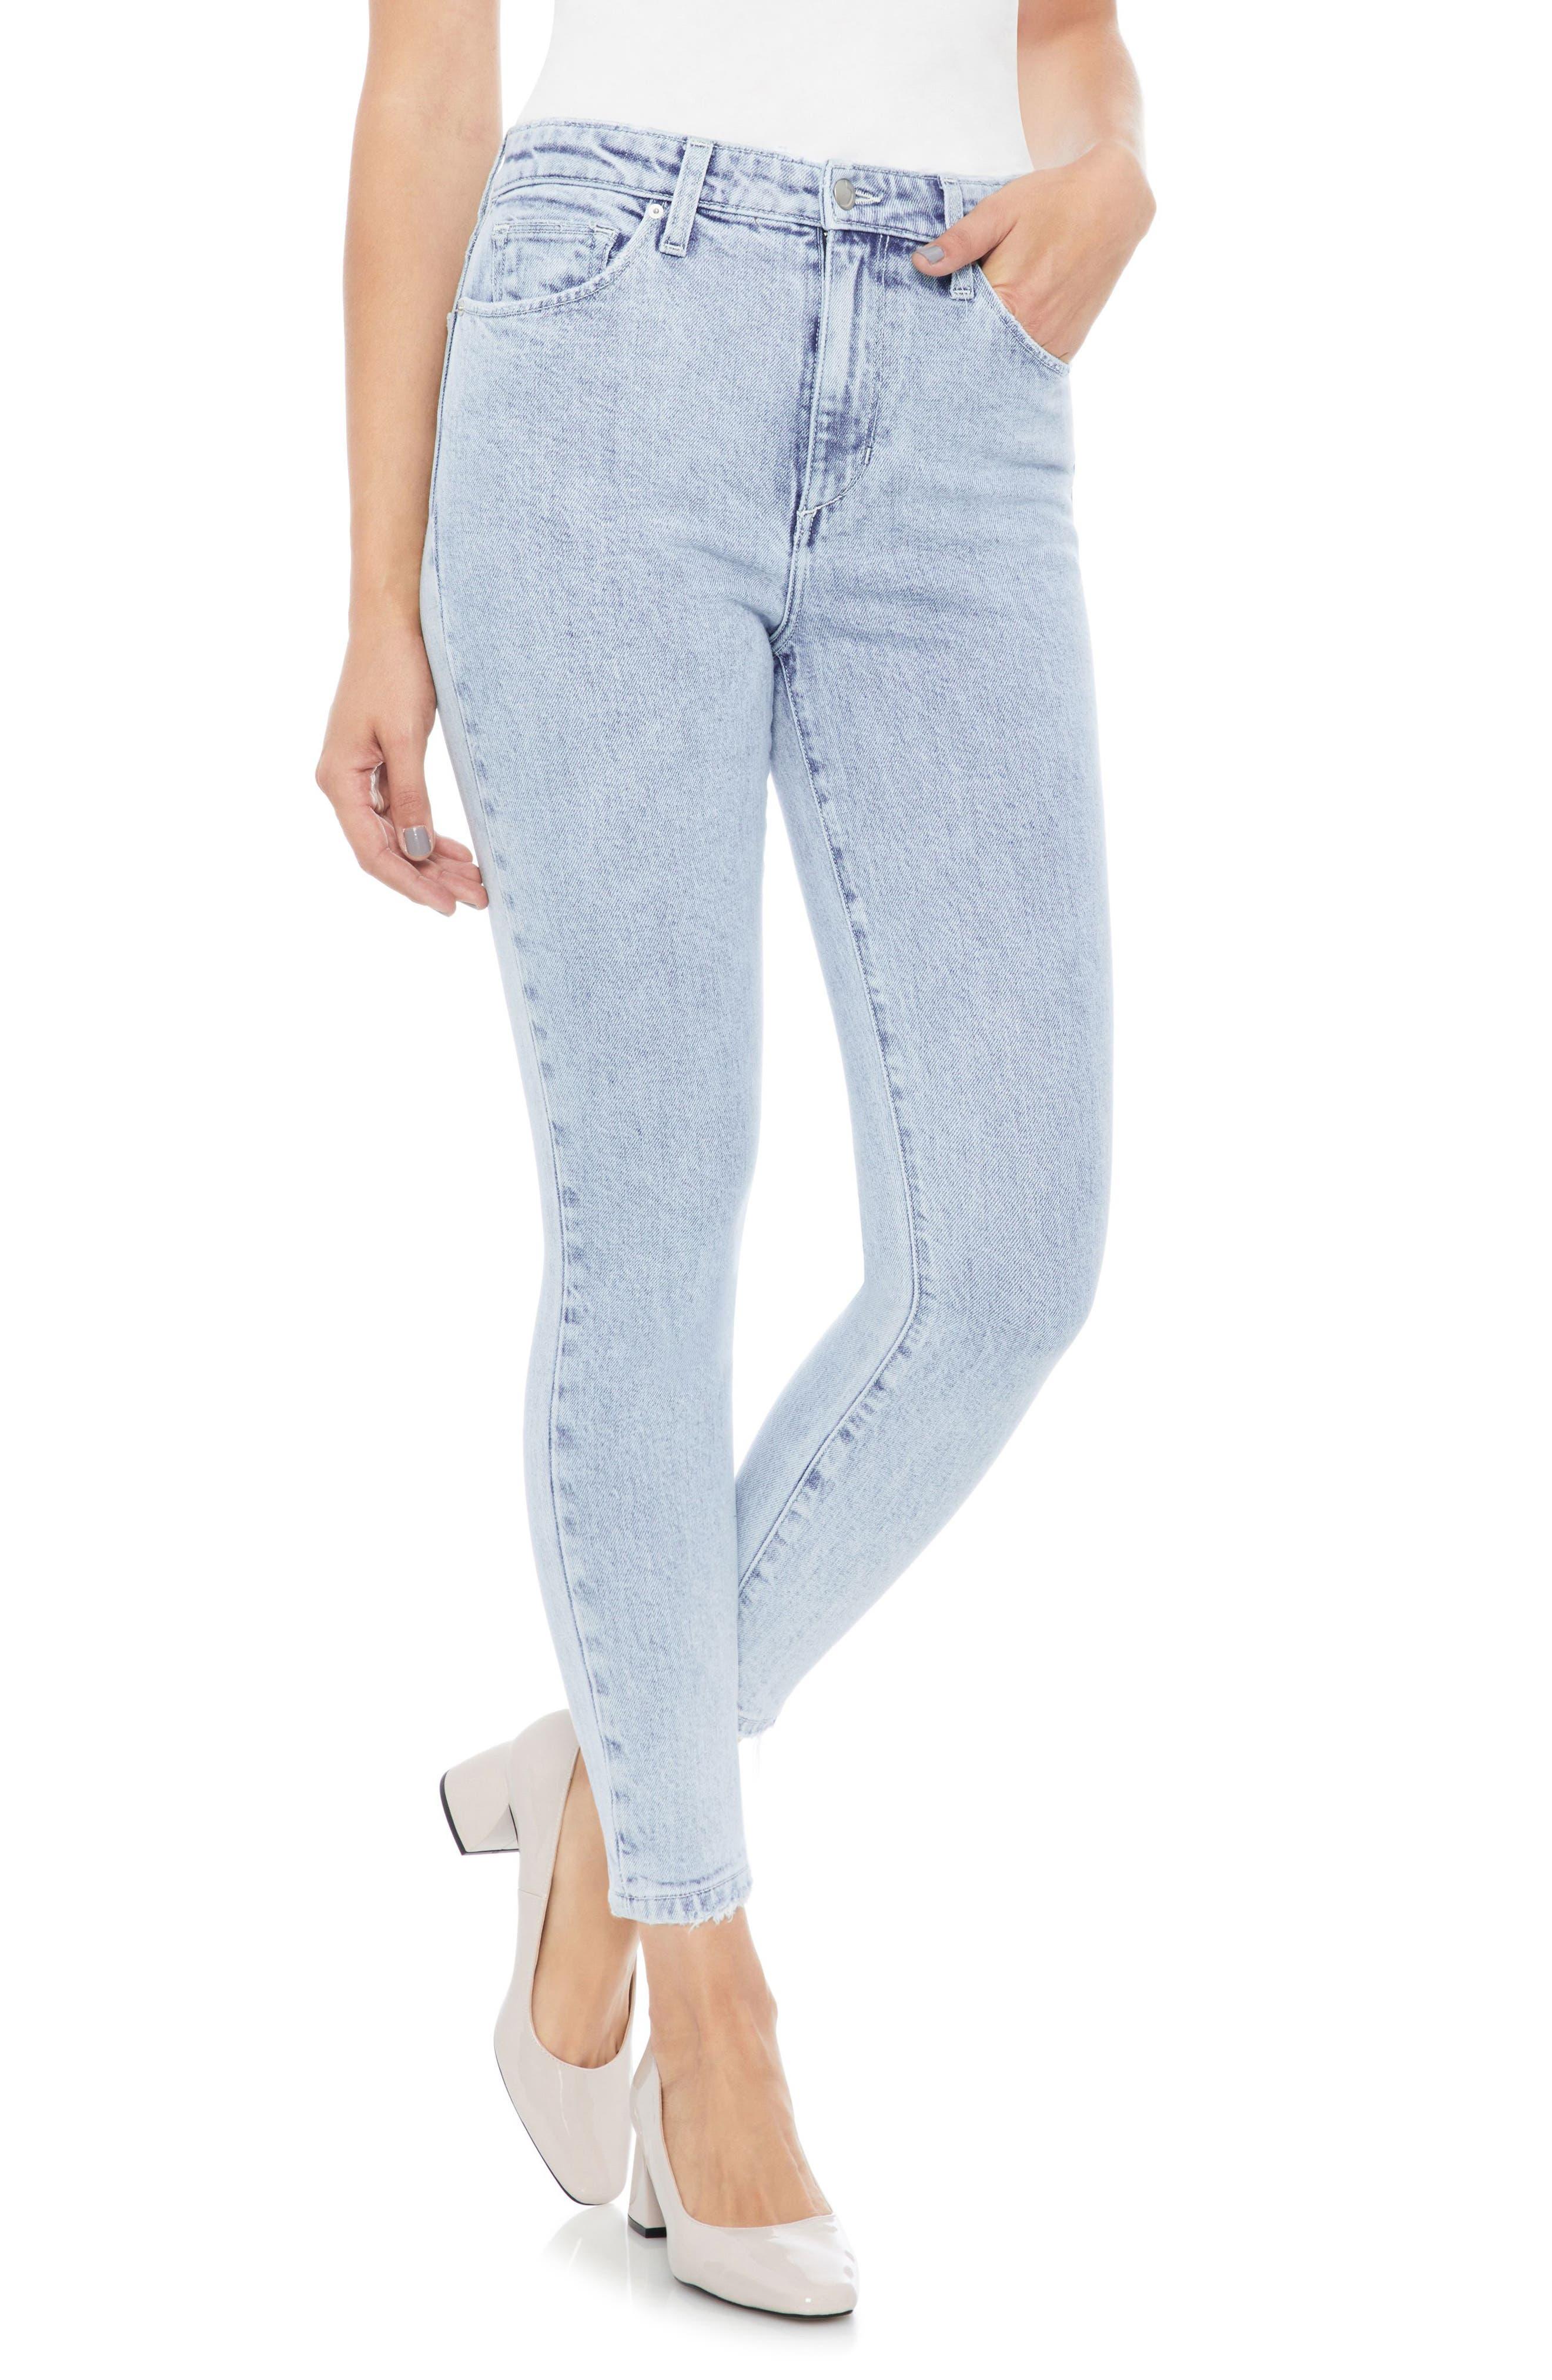 Bella High Waist Crop Skinny Jeans,                         Main,                         color, Copley